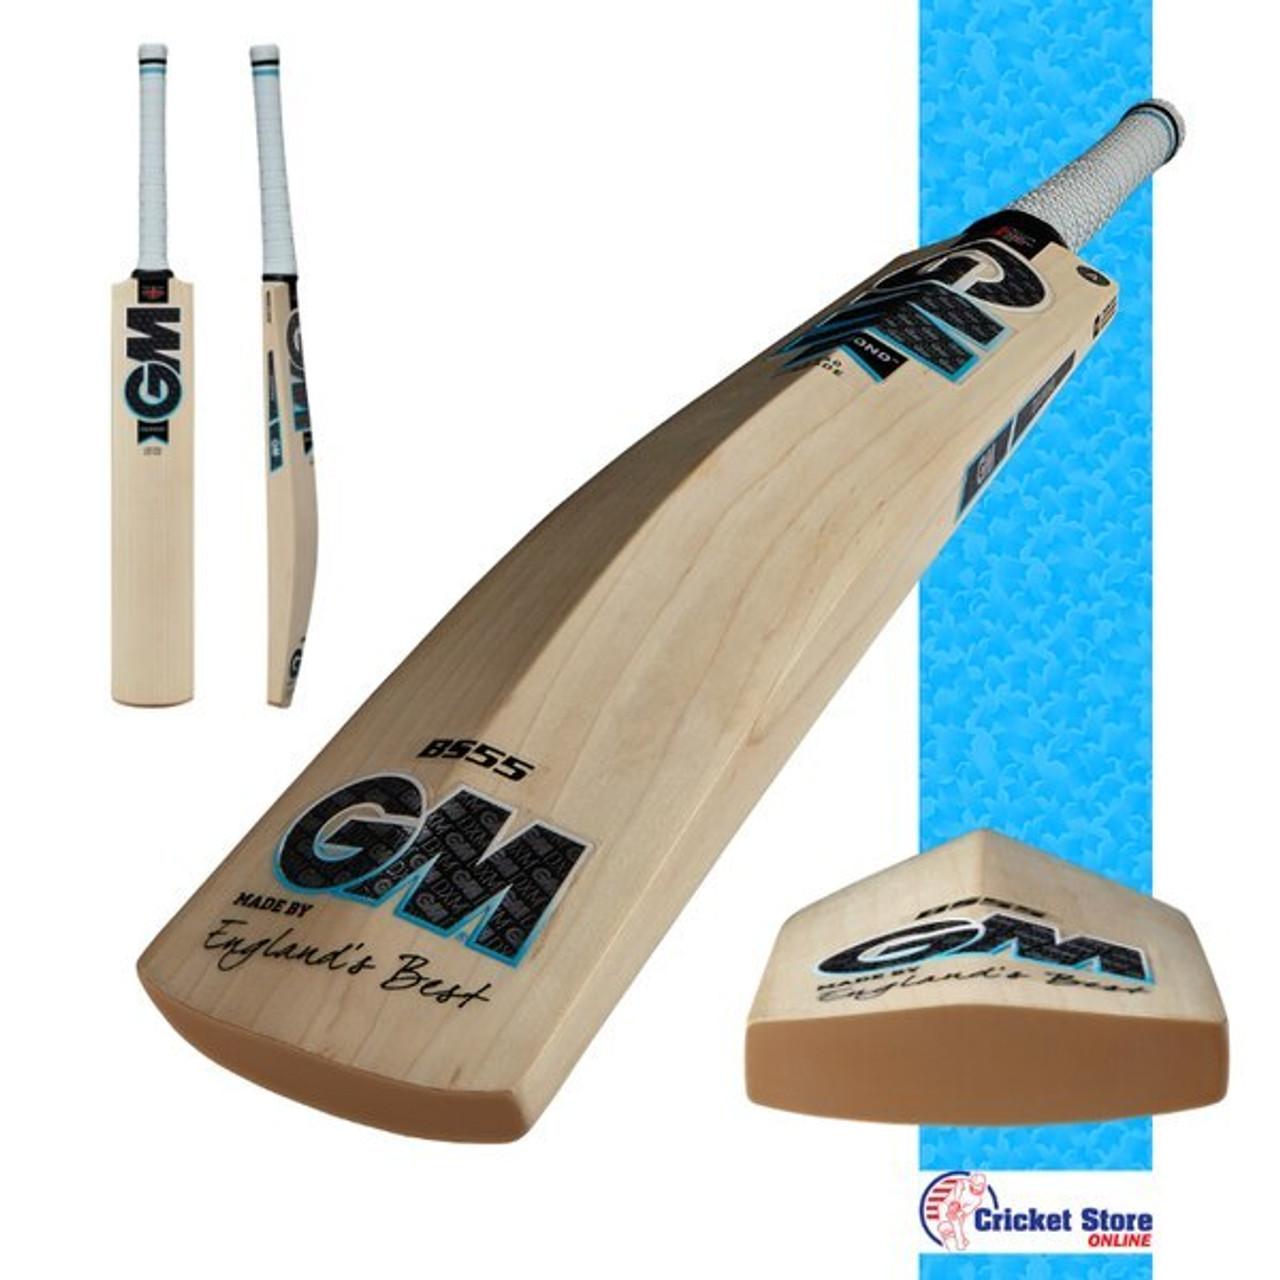 GM Diamond Cricket Bats 2021